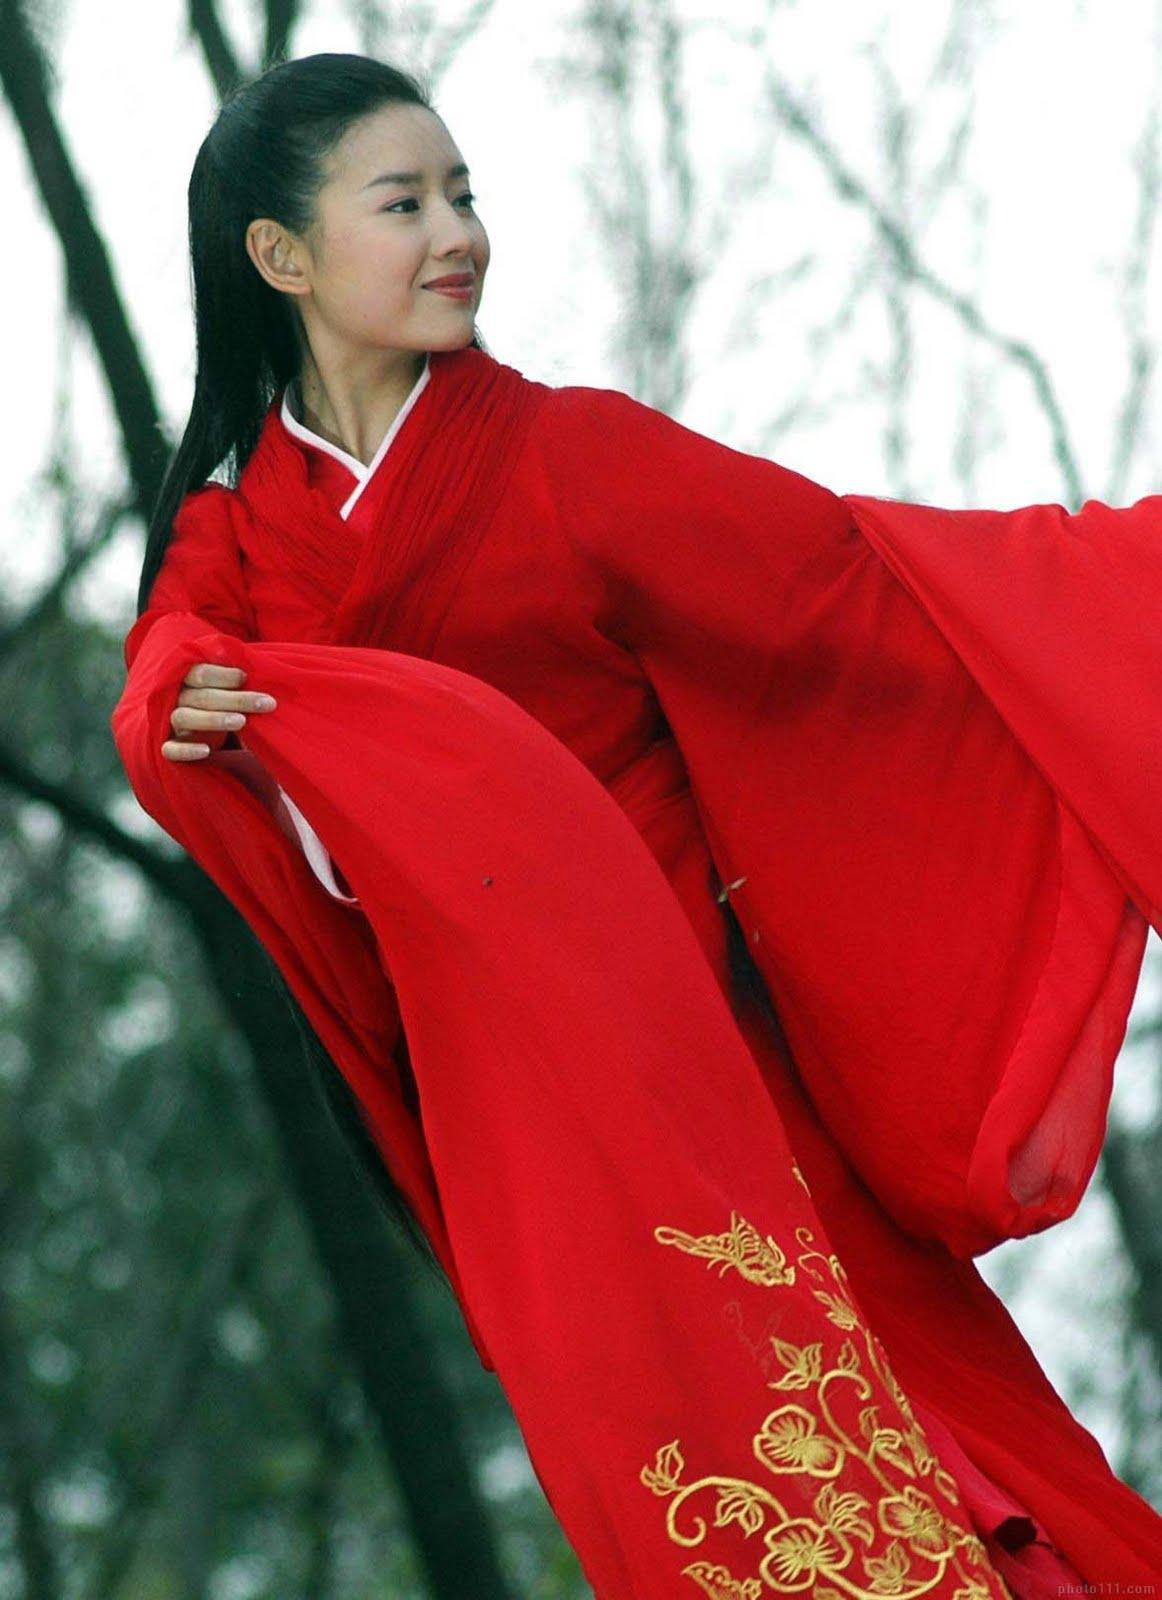 Mei sawai 08 japanese beauties - 1 6